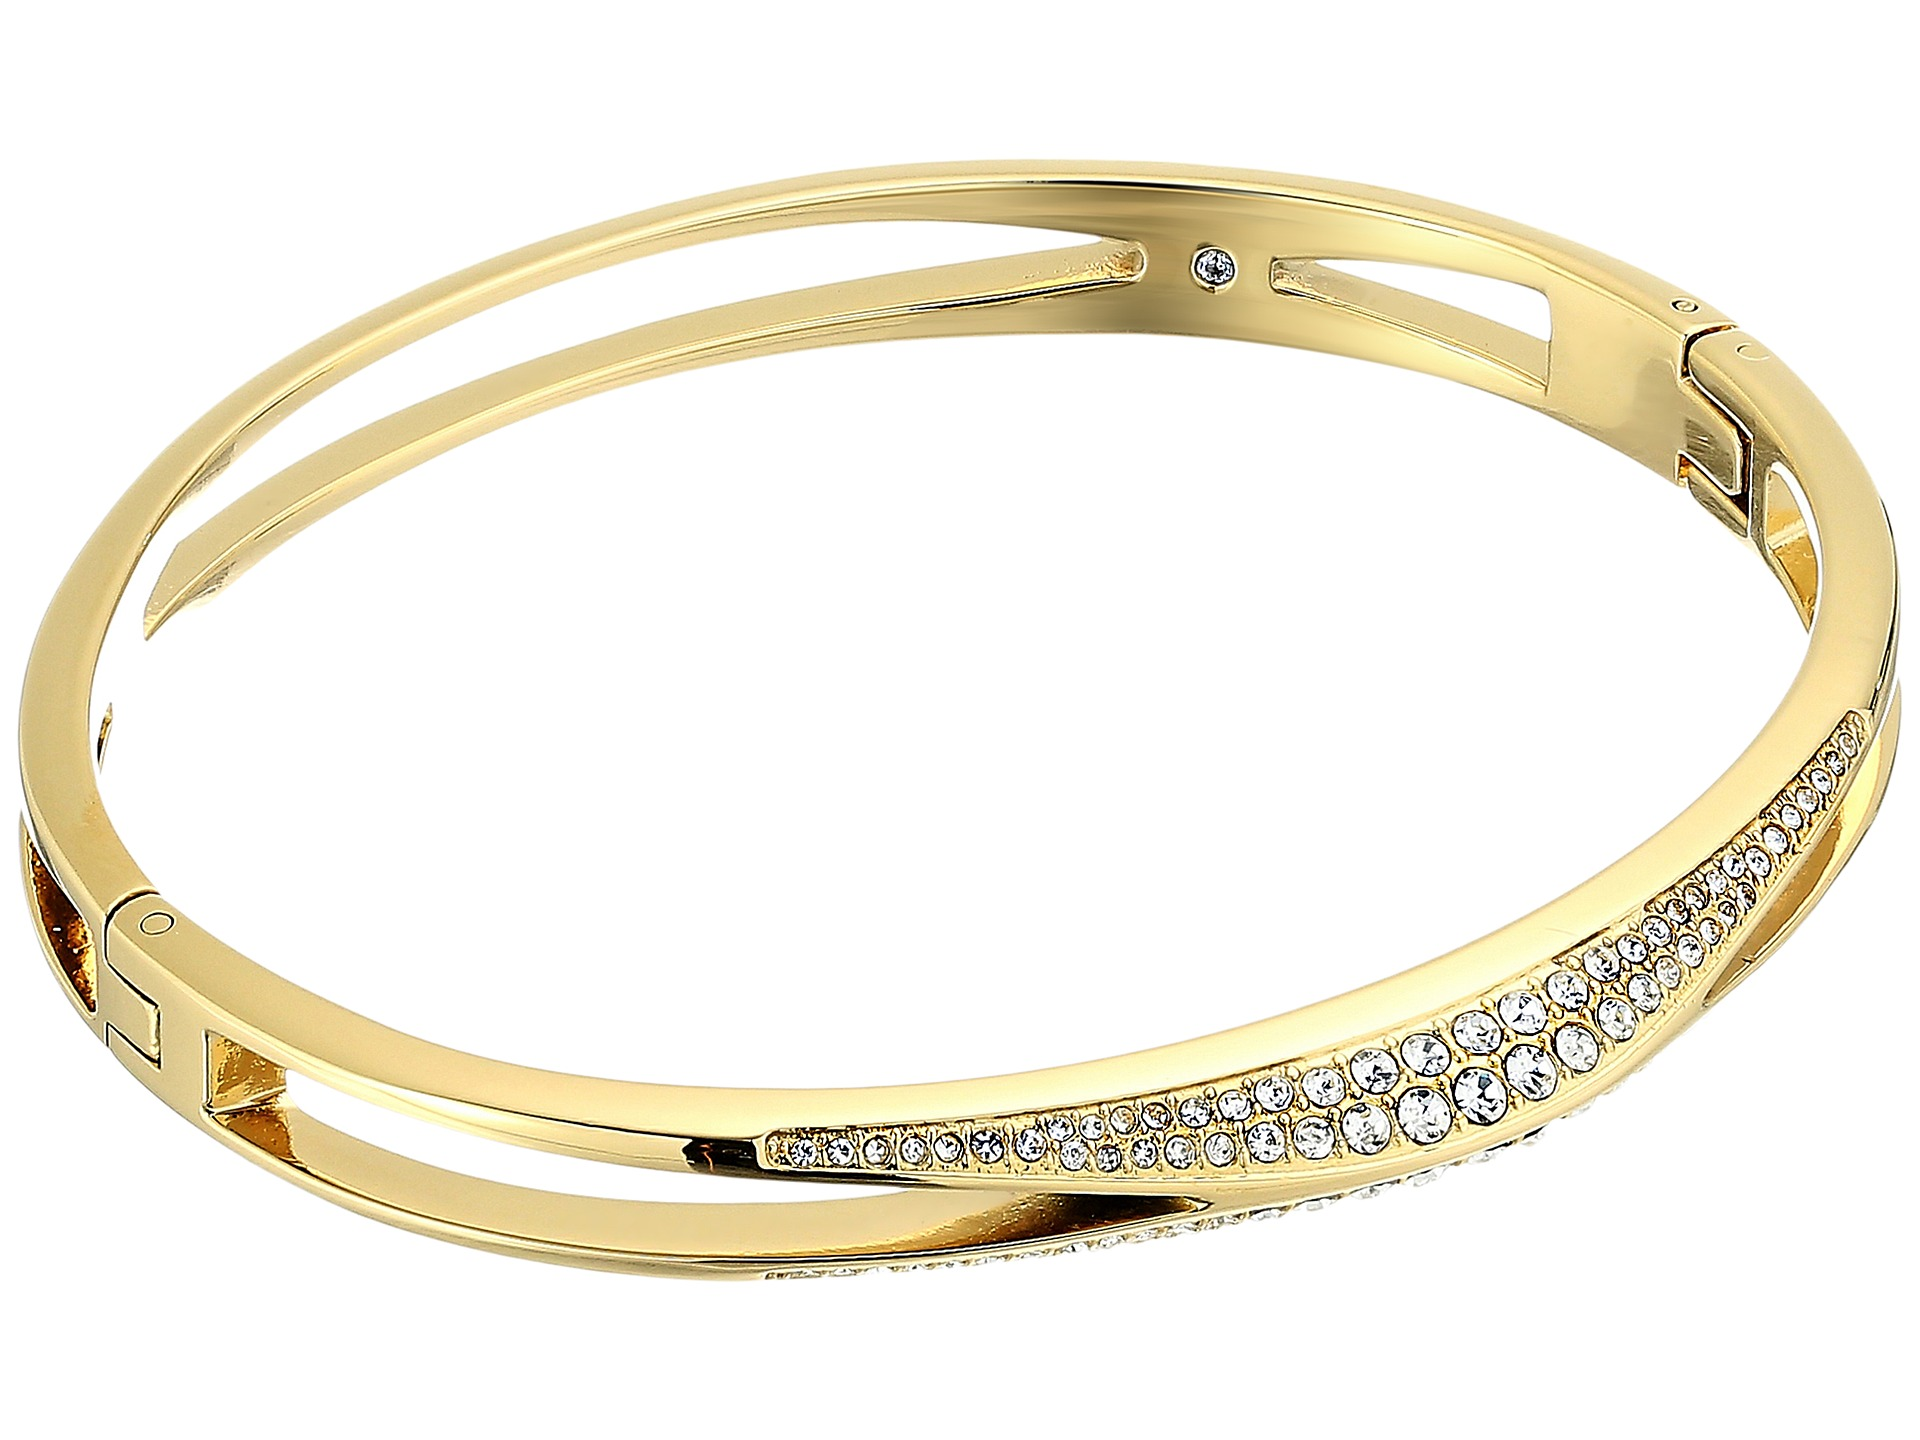 Michael Kors Brilliance Pave Hinged Bangle Bracelet At